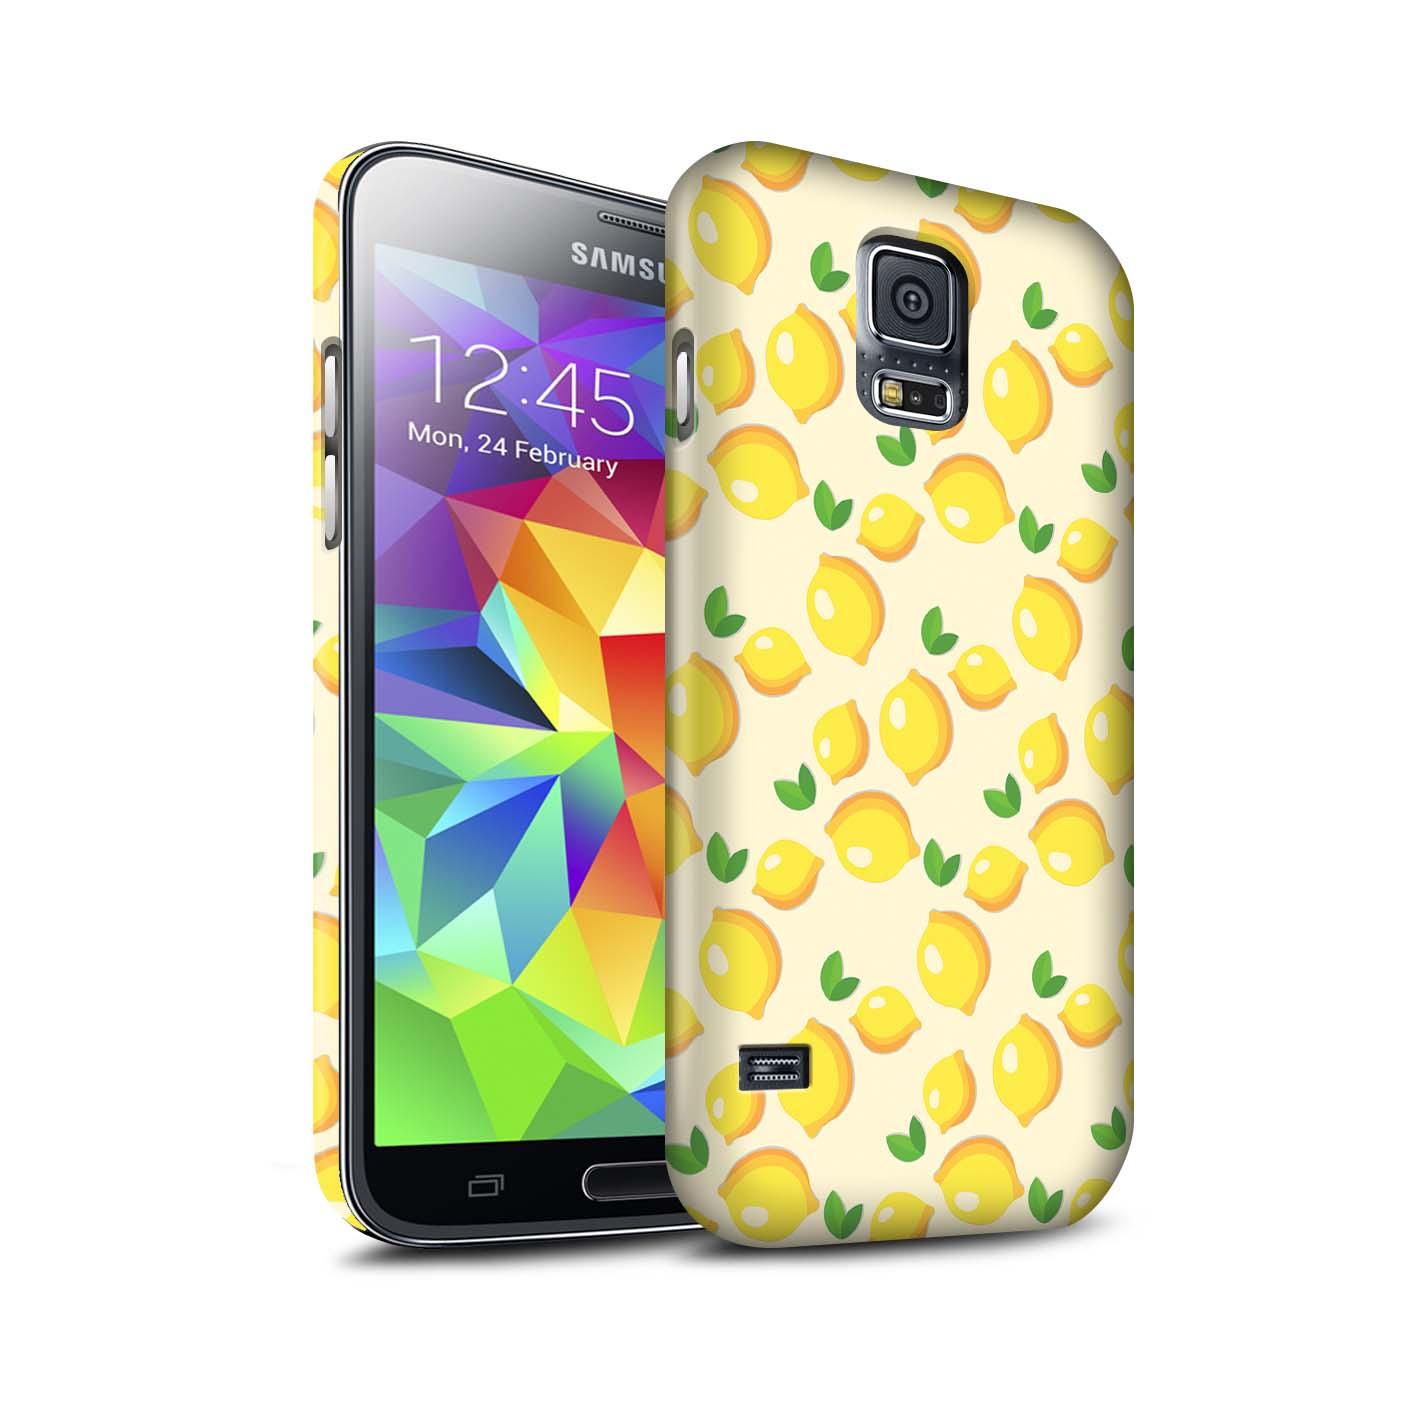 Coque-Etui-Matte-de-STUFF4-pour-Samsung-Galaxy-S5-SV-Mode-Jaune